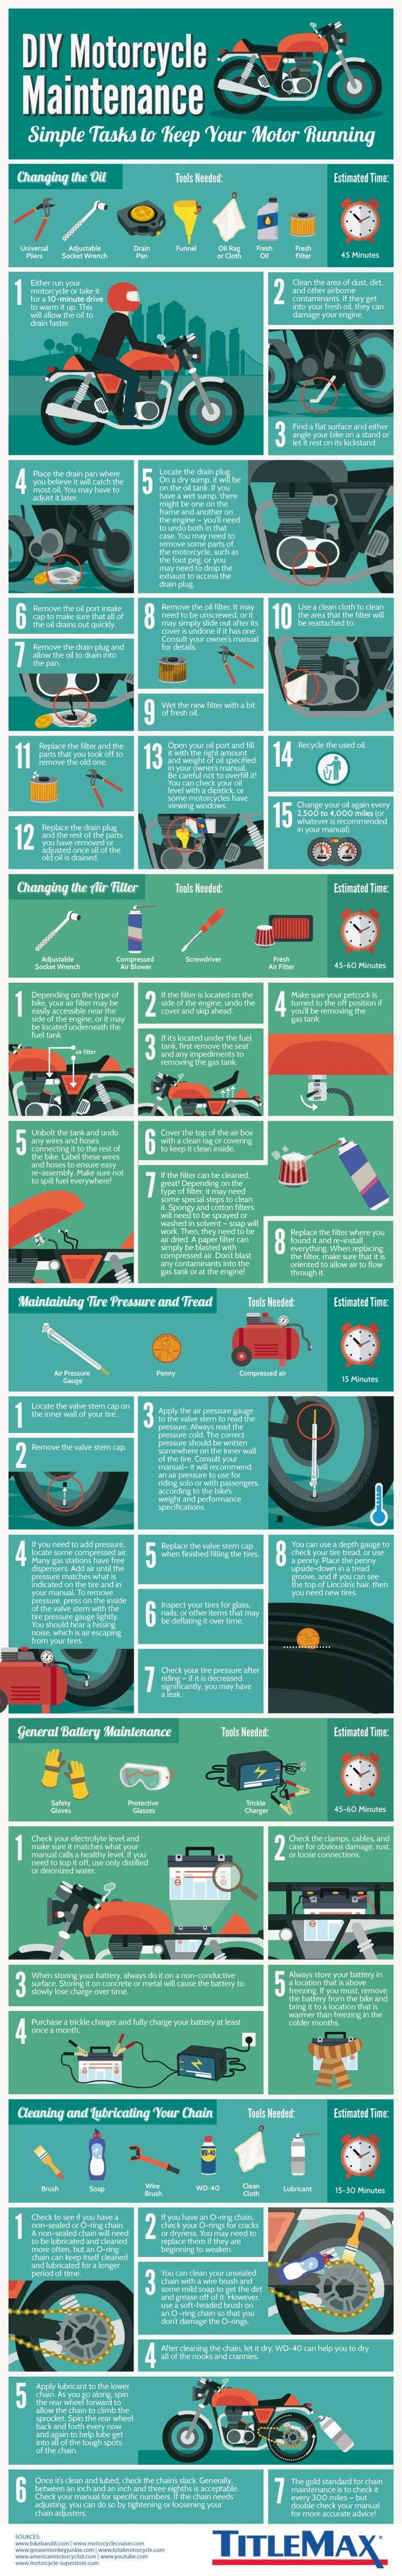 DIY Motorcycle Maintenance Infographic